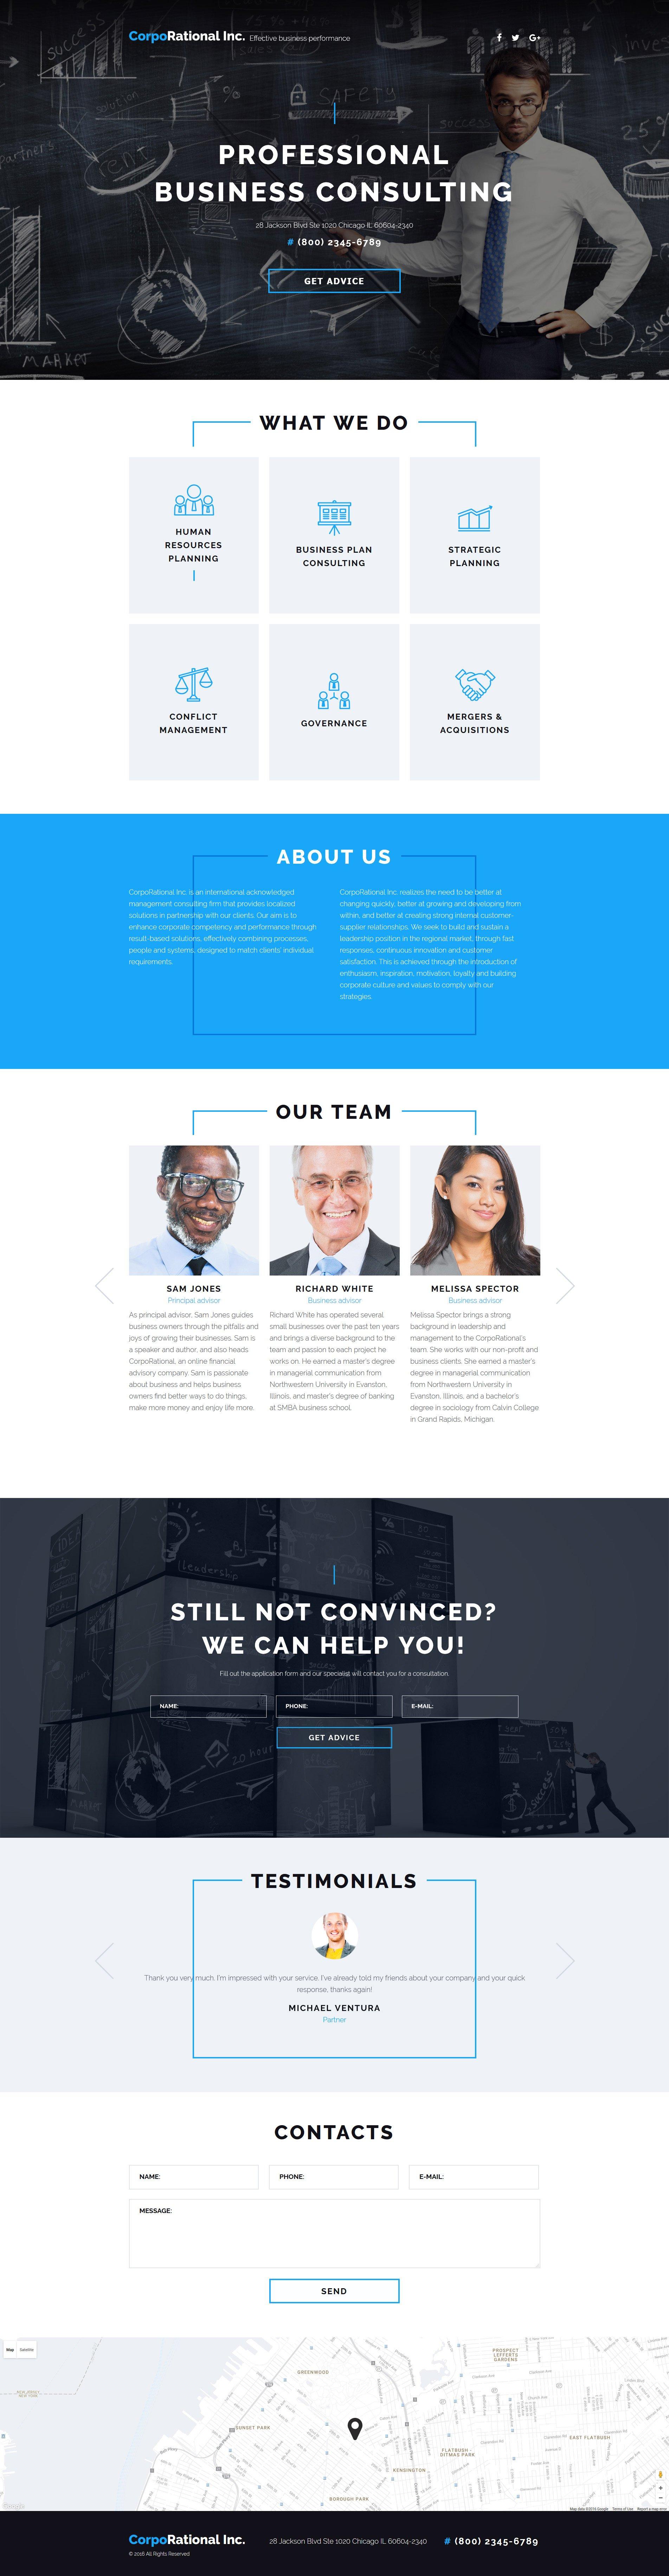 Szablon Landing Page #58067 na temat: usługi doradcze - zrzut ekranu